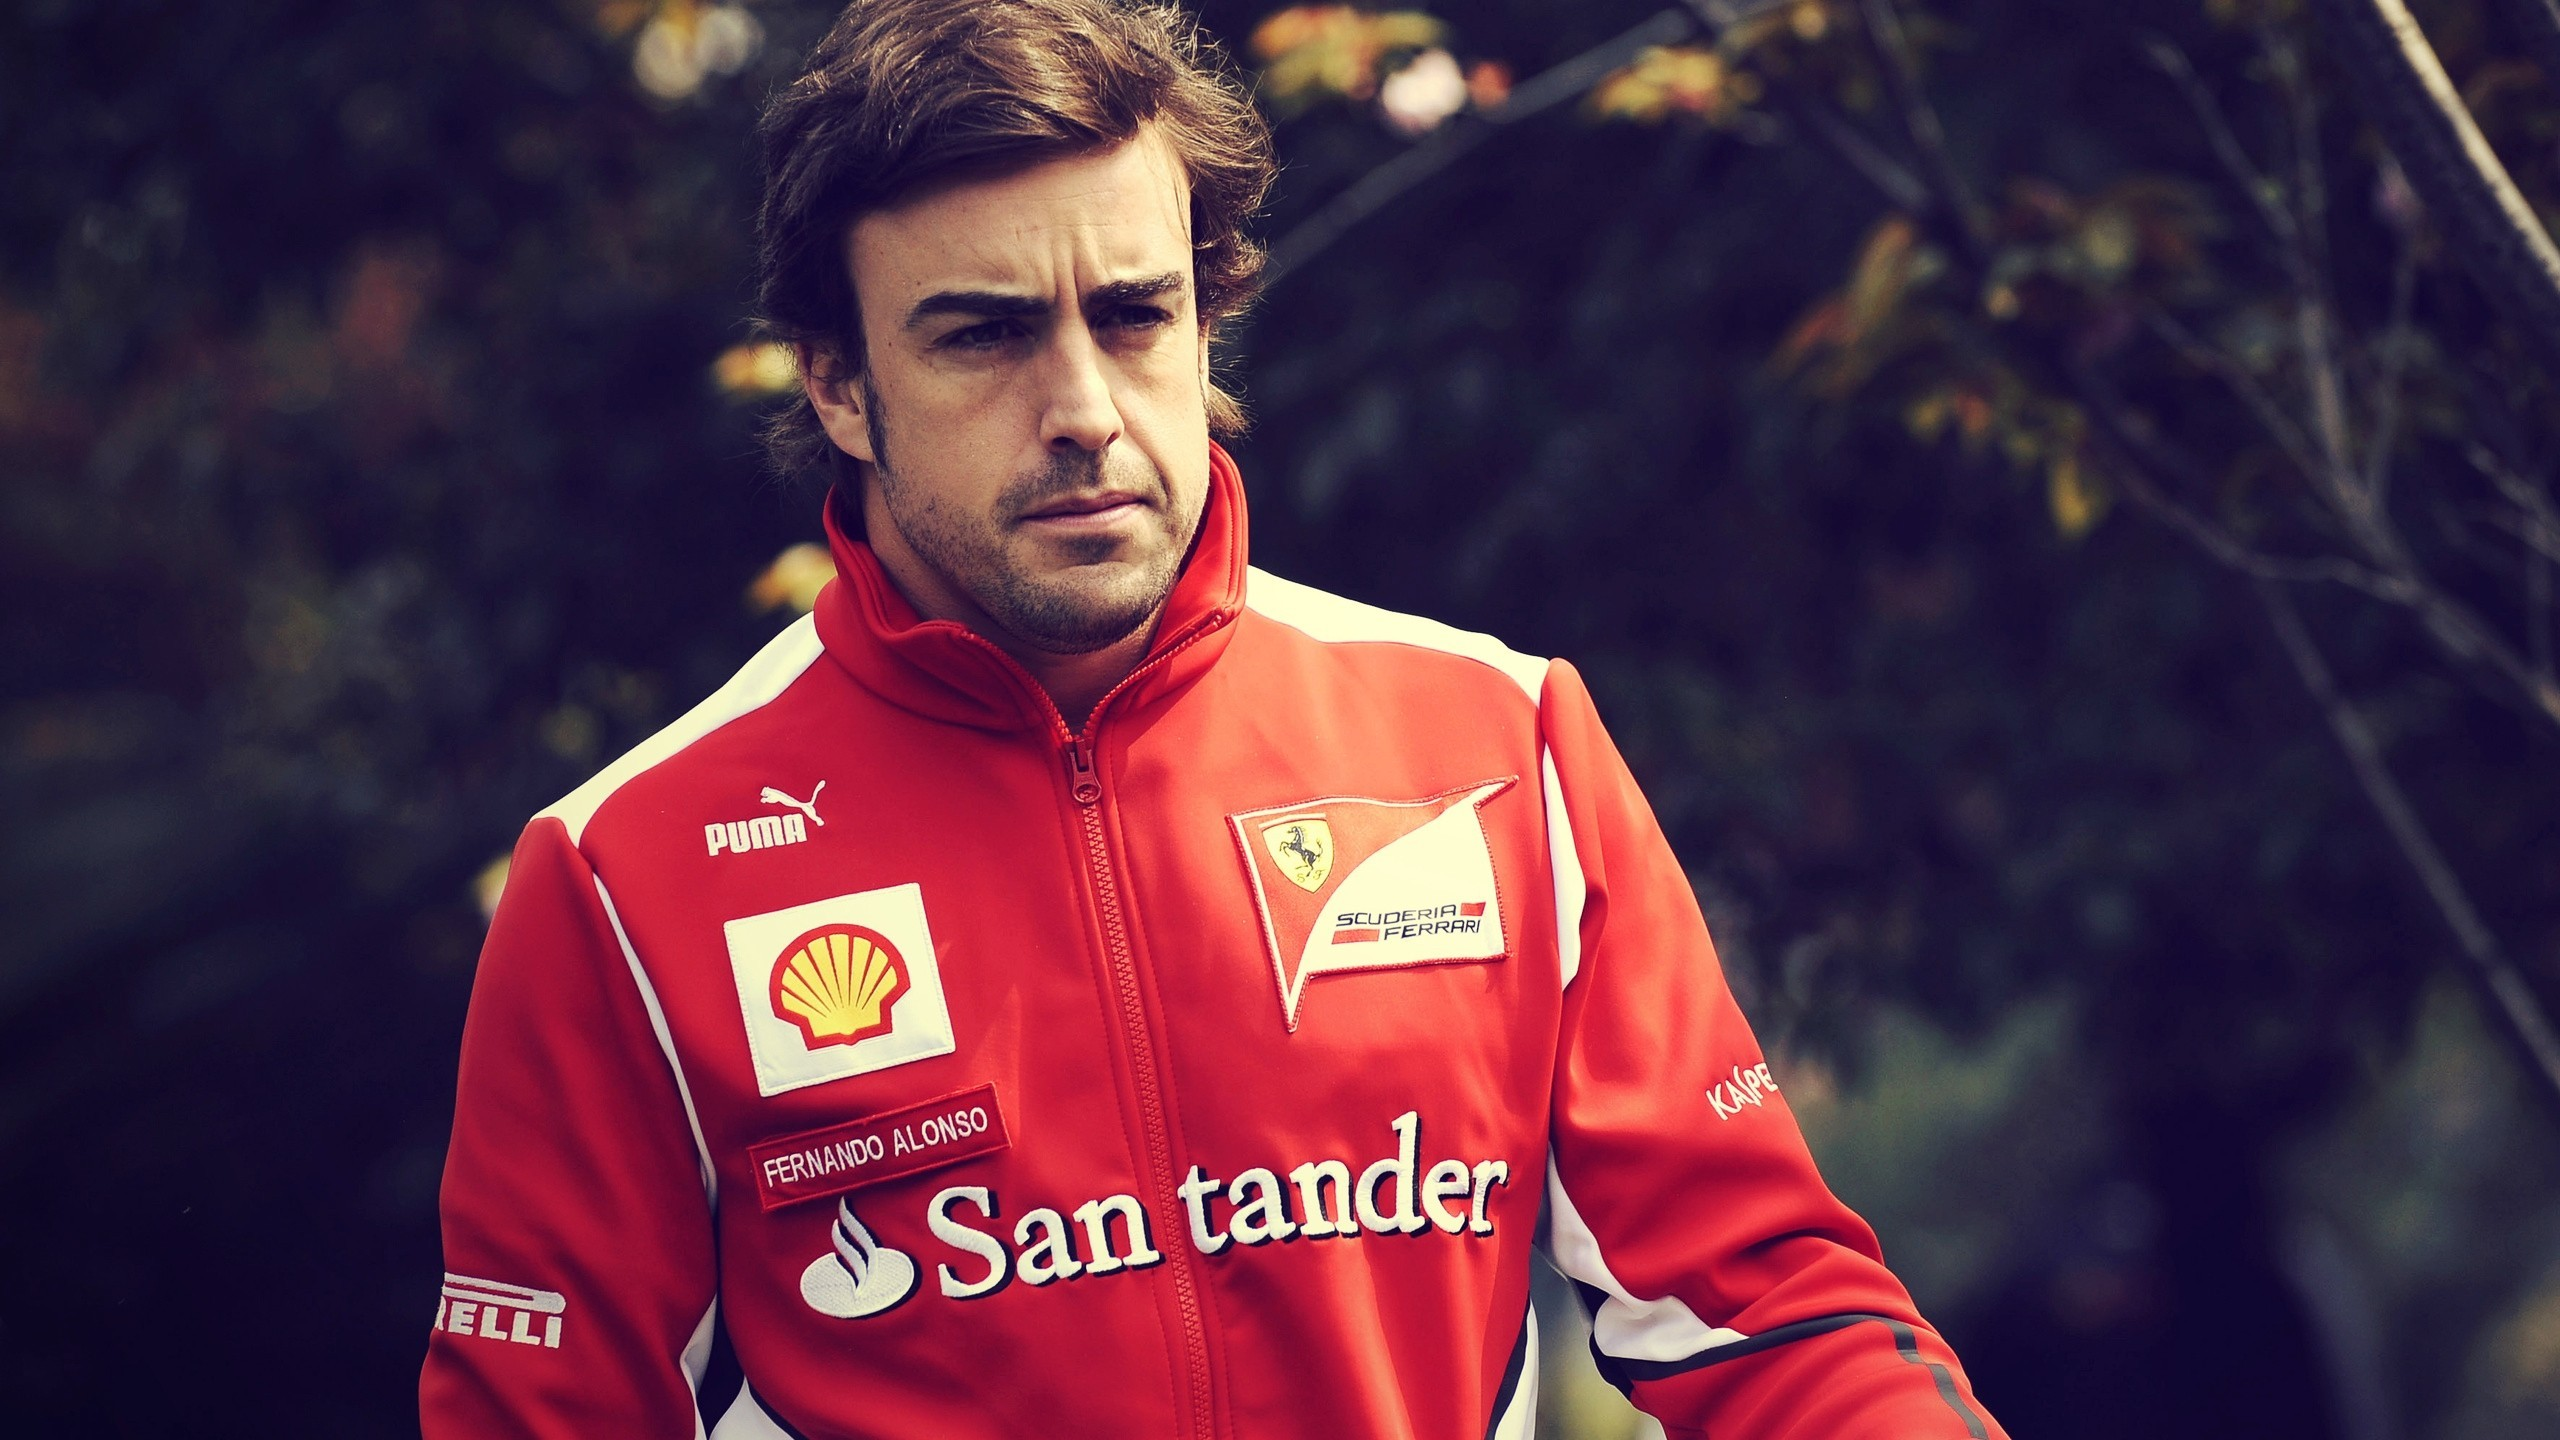 People 2560x1440 men Driver Ferrari world champion